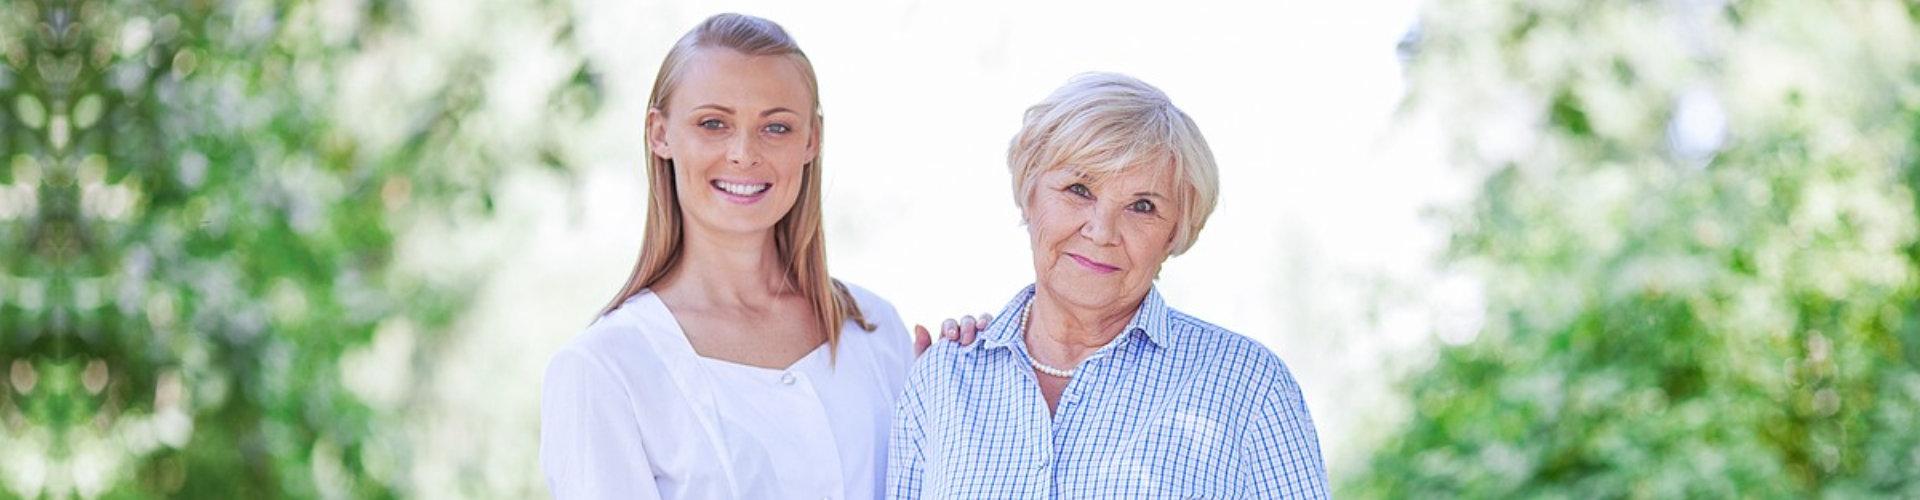 caregiver conducting facility tour